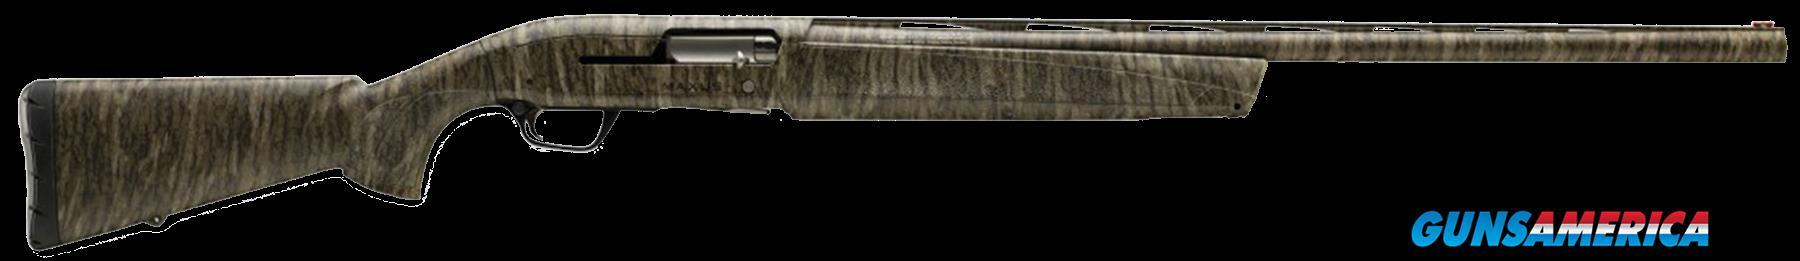 Browning Maxus, Brn 011-654204 Maxus         12 28 3.5    Mobl  Guns > Pistols > 1911 Pistol Copies (non-Colt)